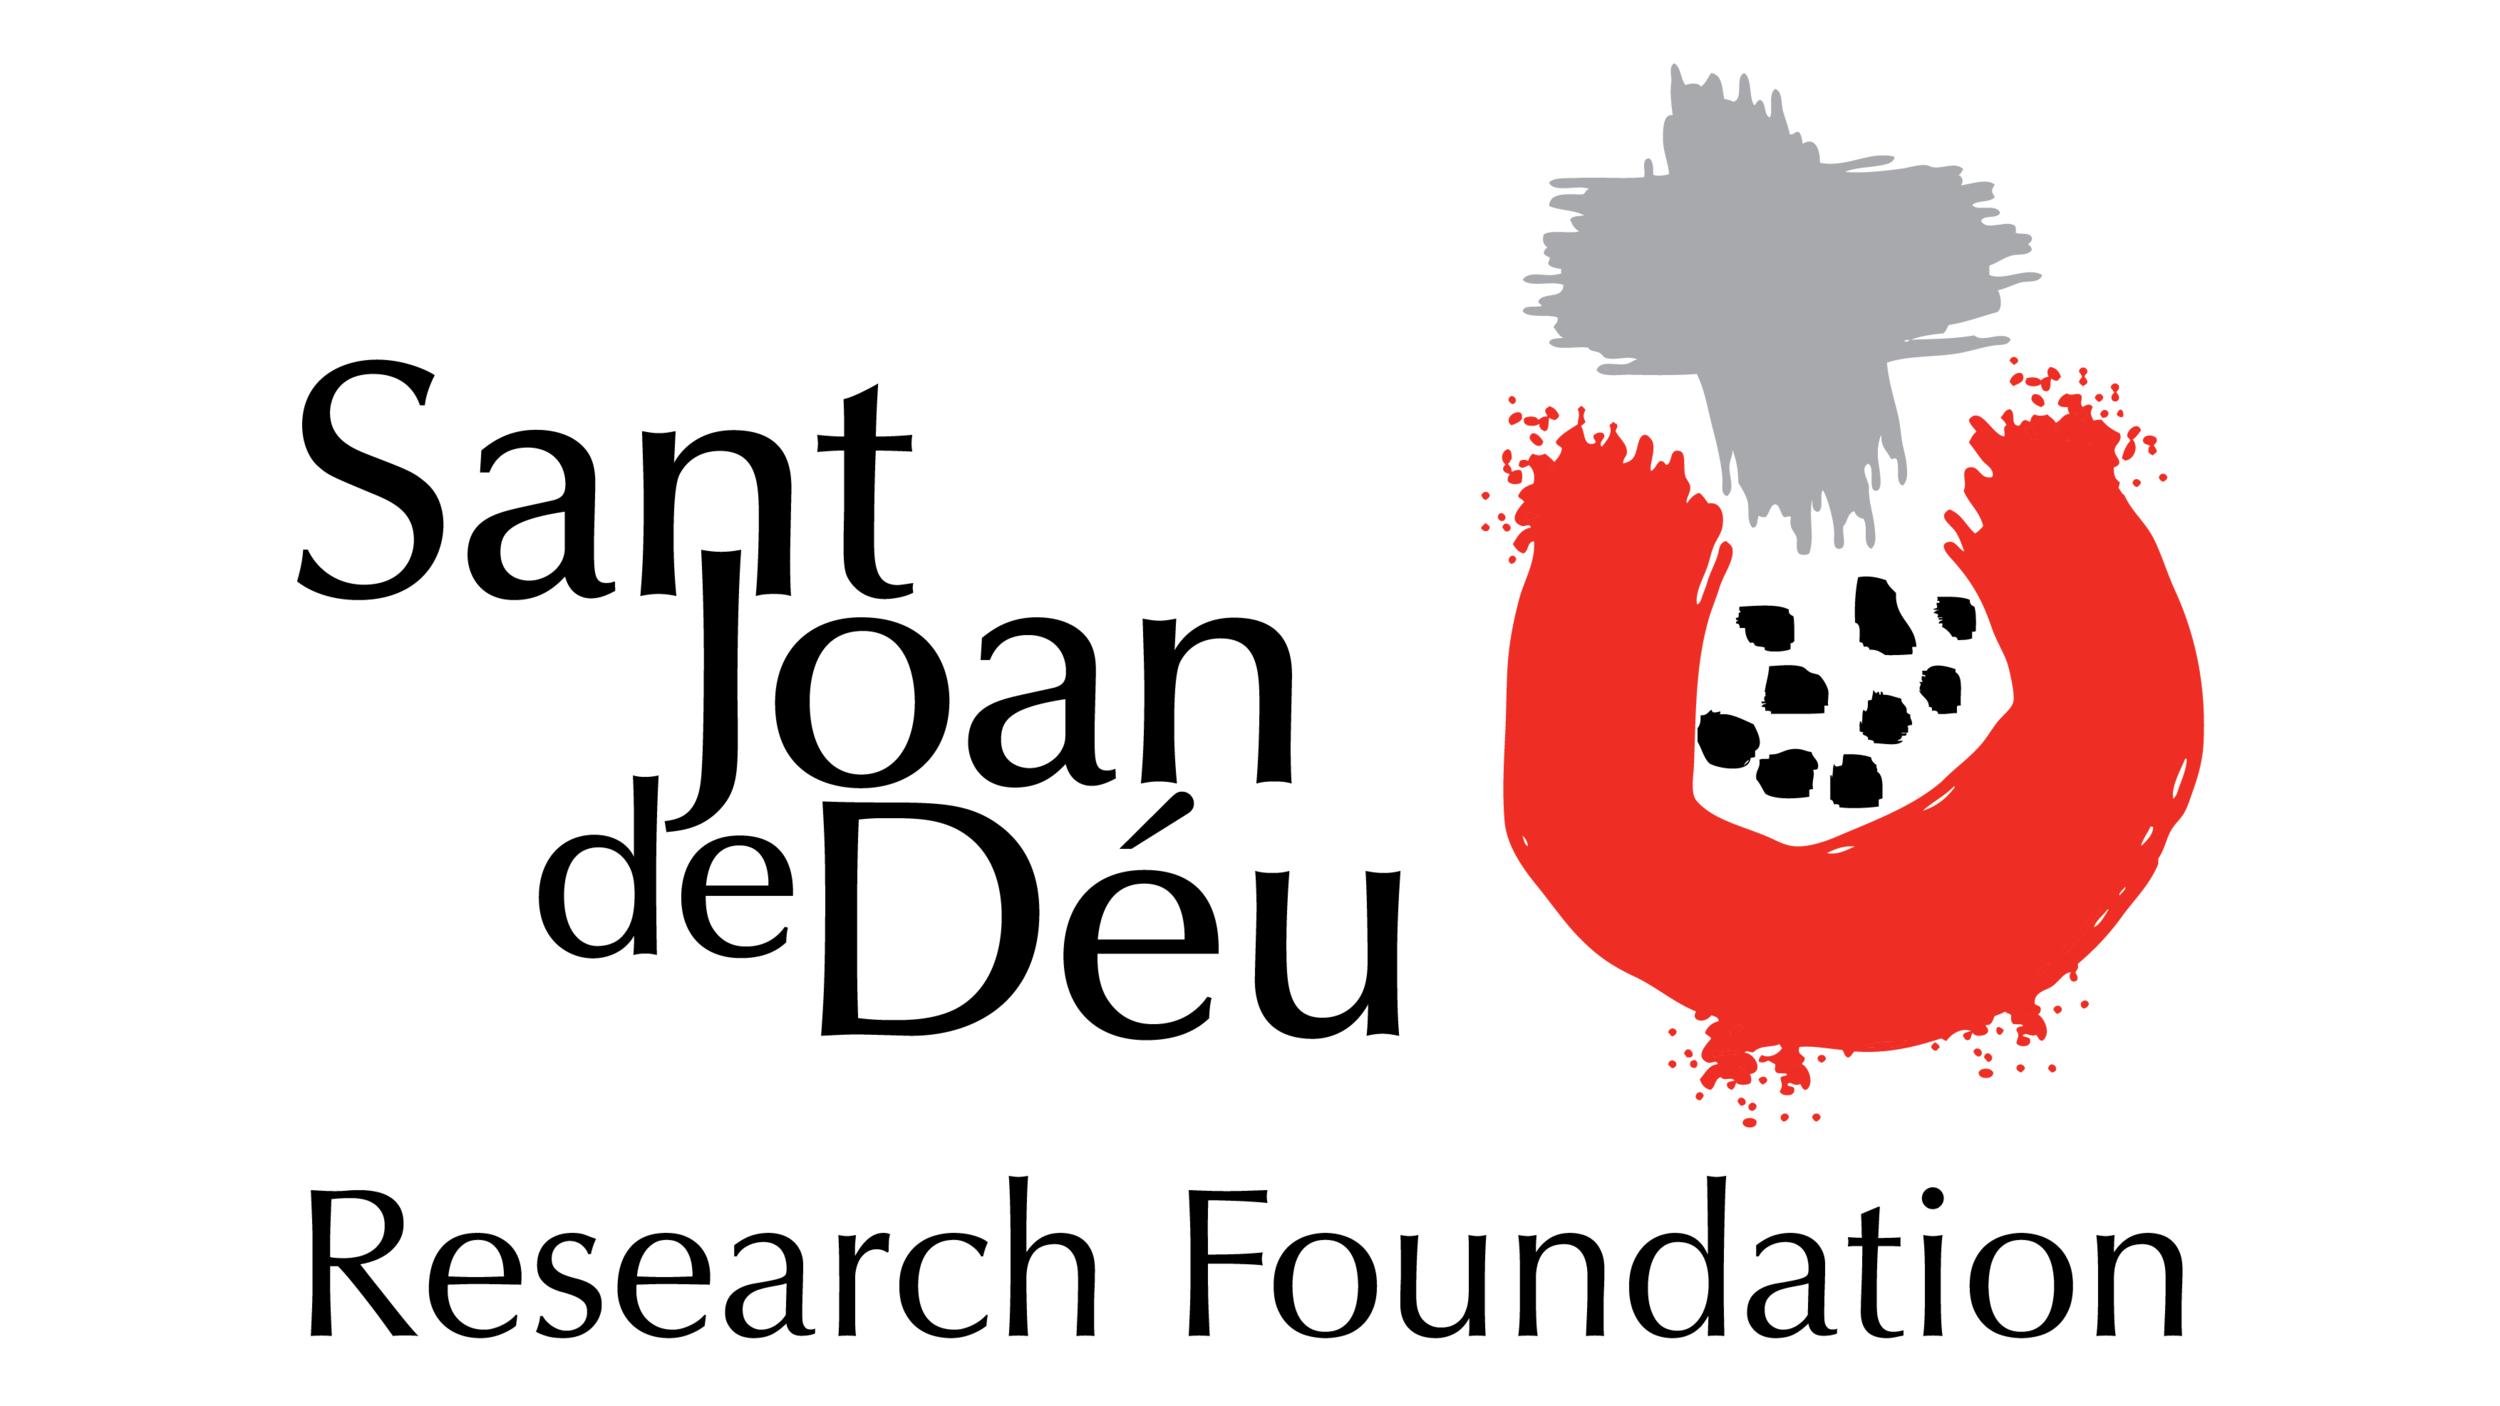 asociacion-anita-sant-joan-de-deu-research-foundation-logo-investigacion-tumor-celulas-germinales-germ-cell-tumor-research-jaume-mora-james-amatruda